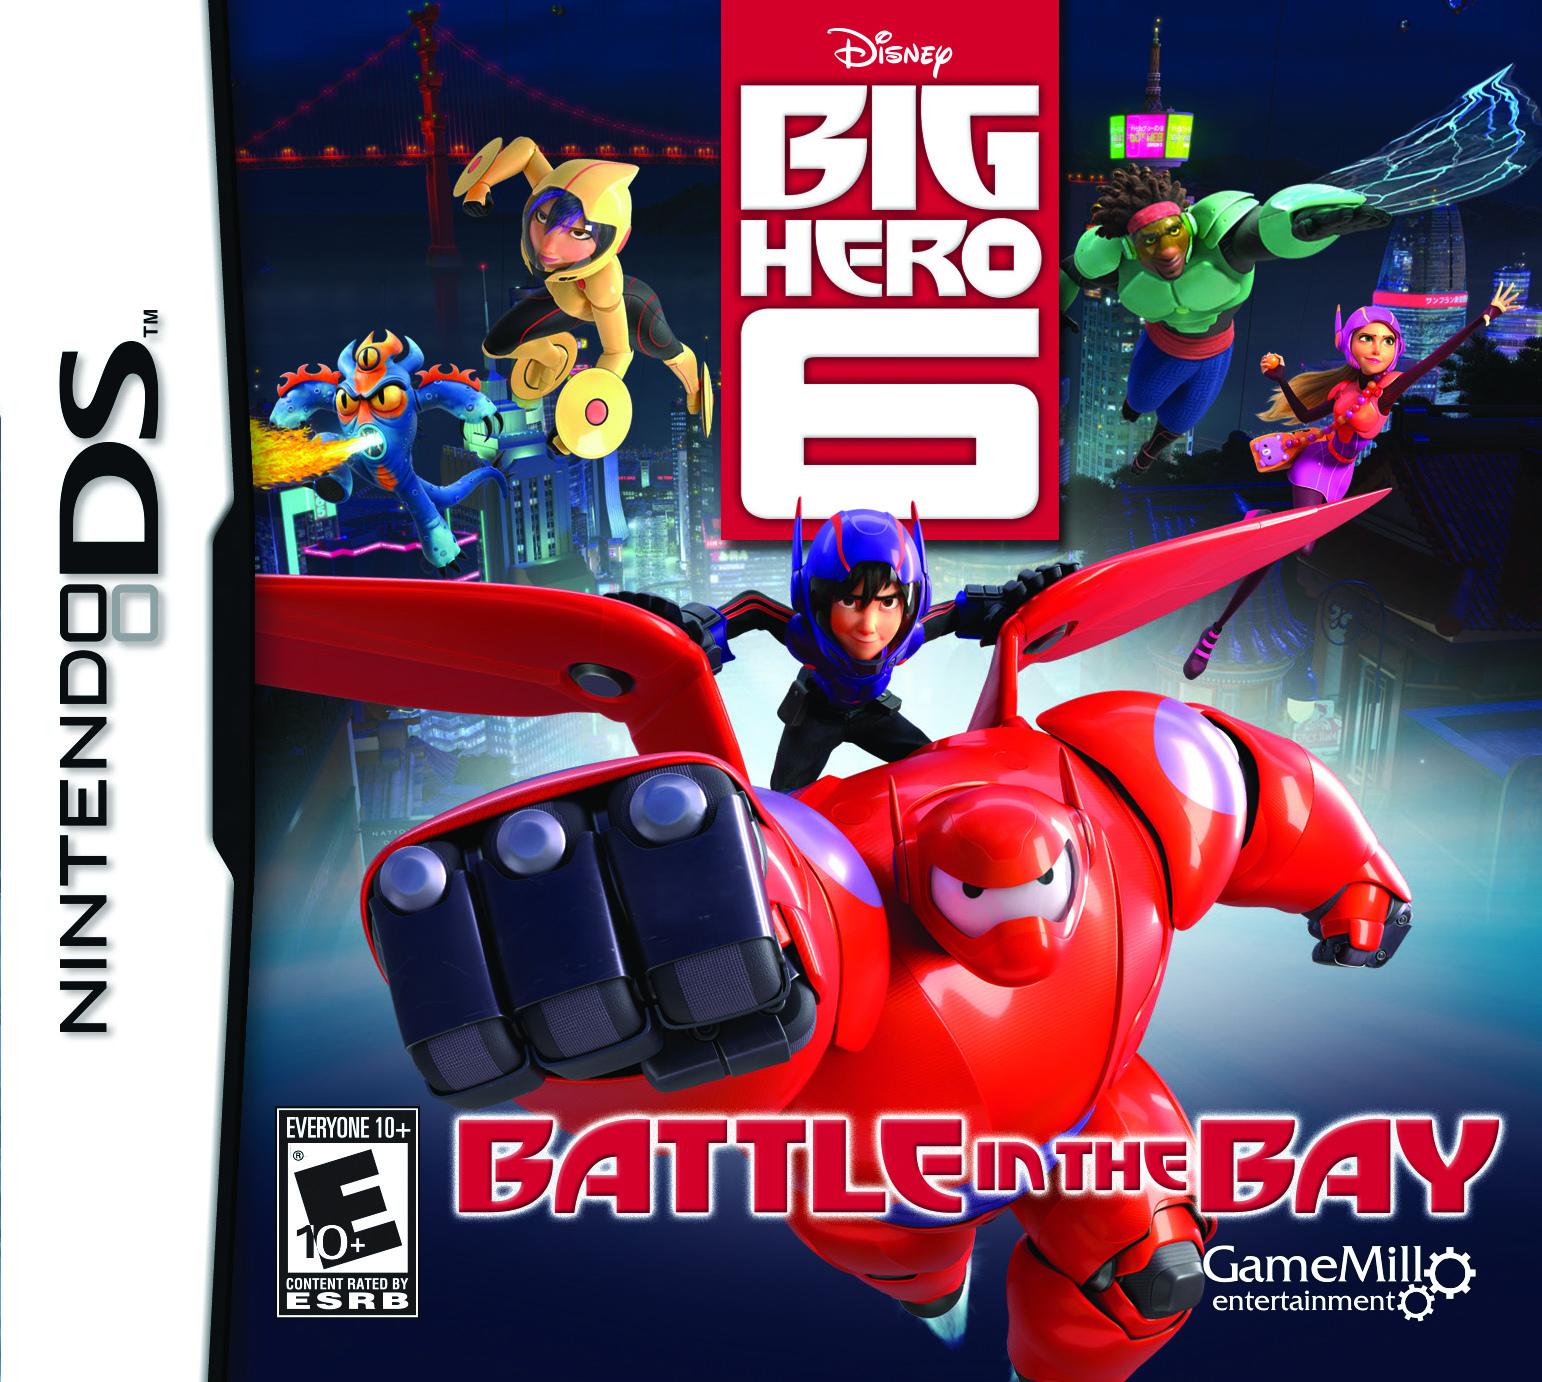 Big Hero 6: Battle in the Bay | Disney LOL - photo#28